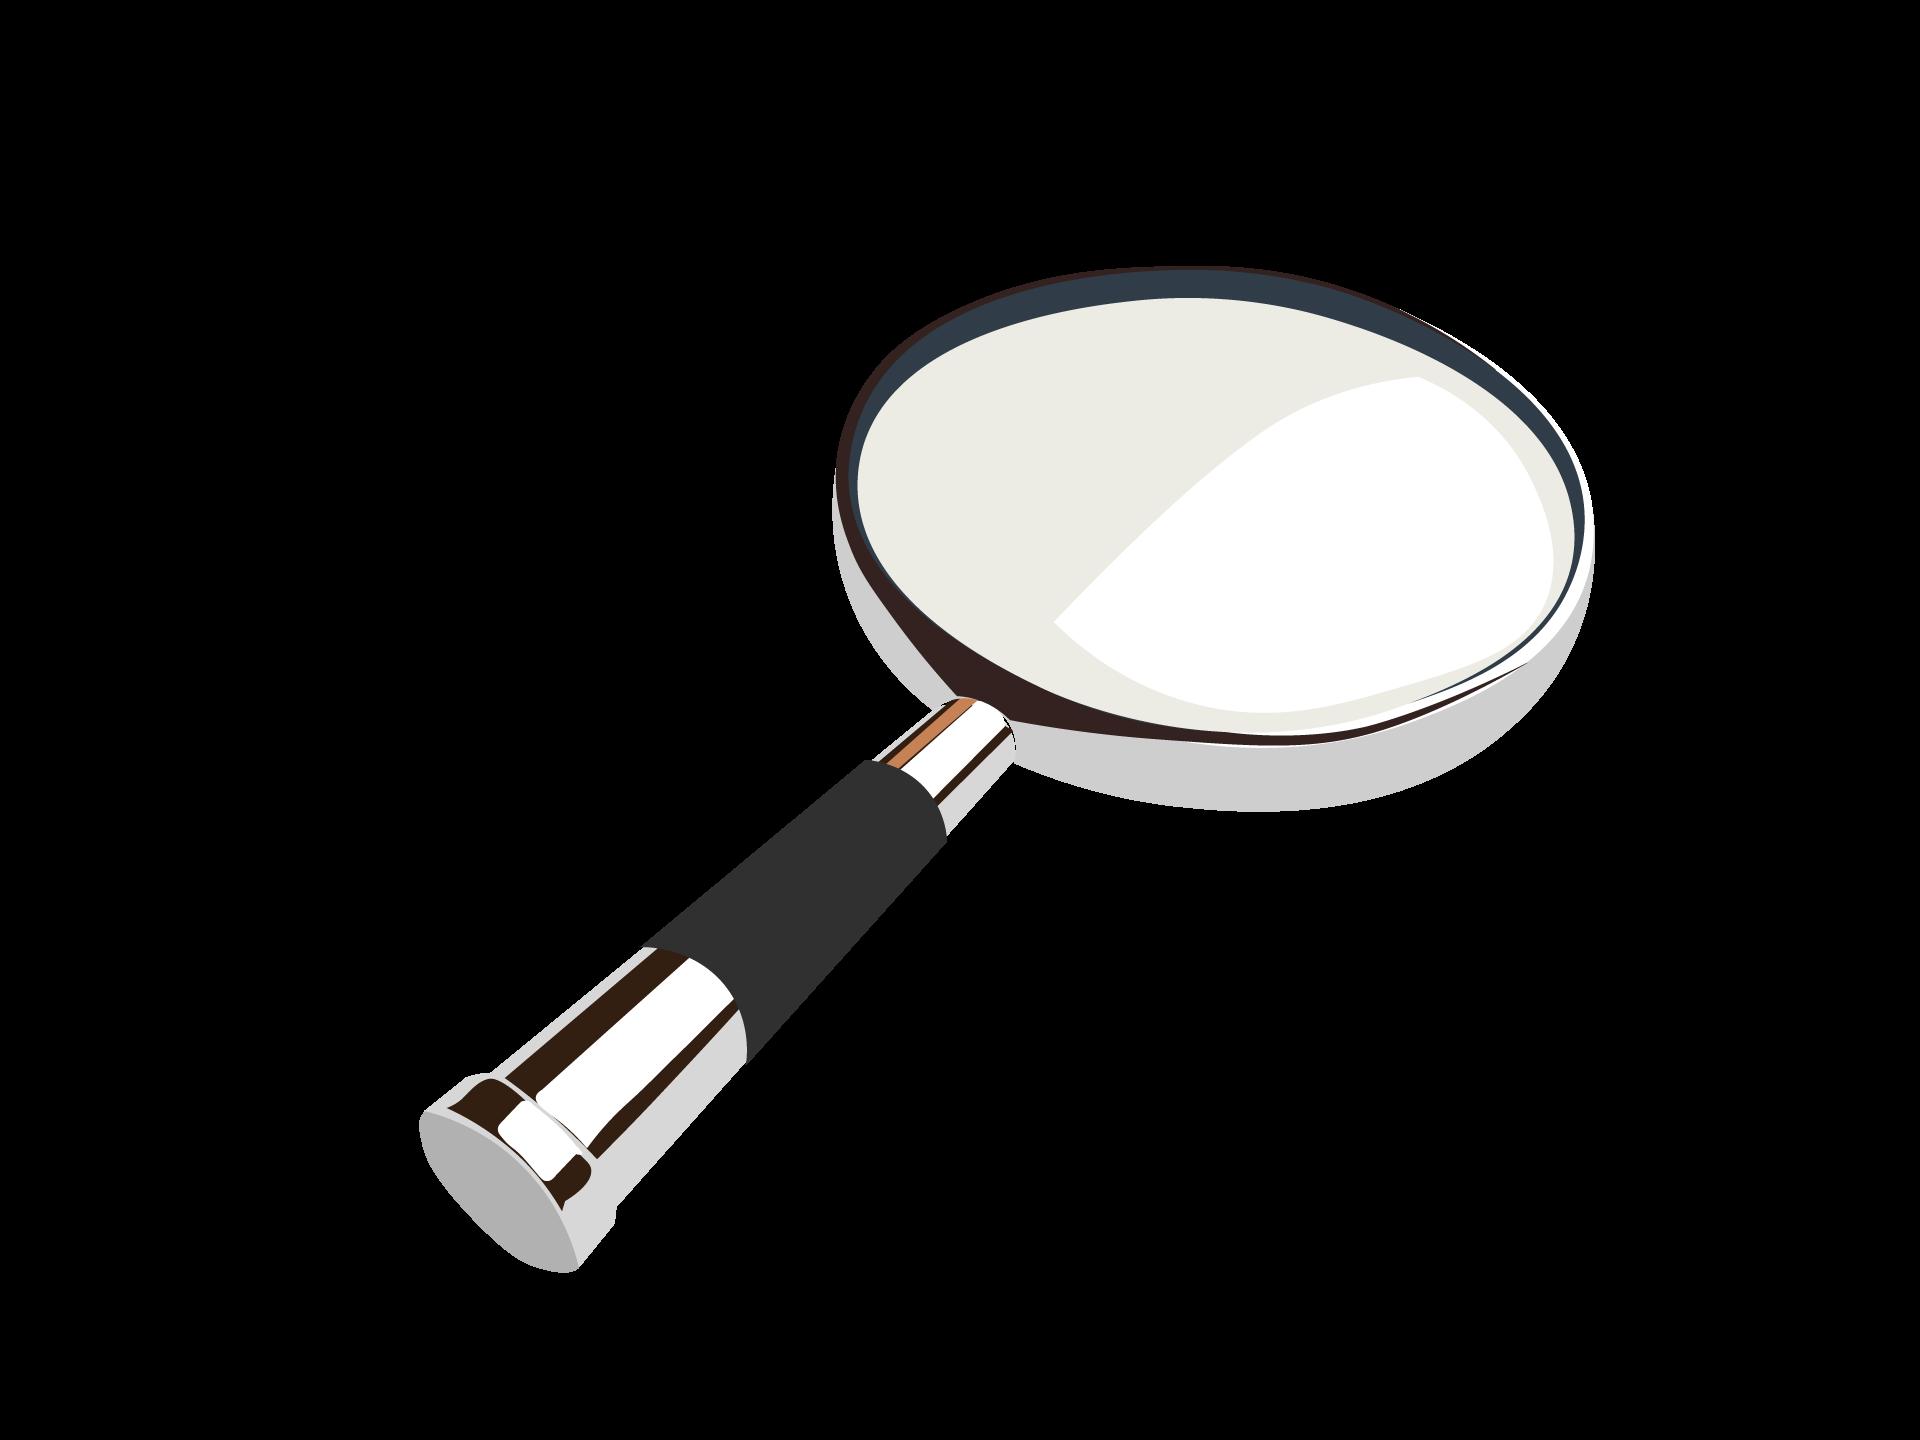 Servicios aMc SEO Search Engine Optimization